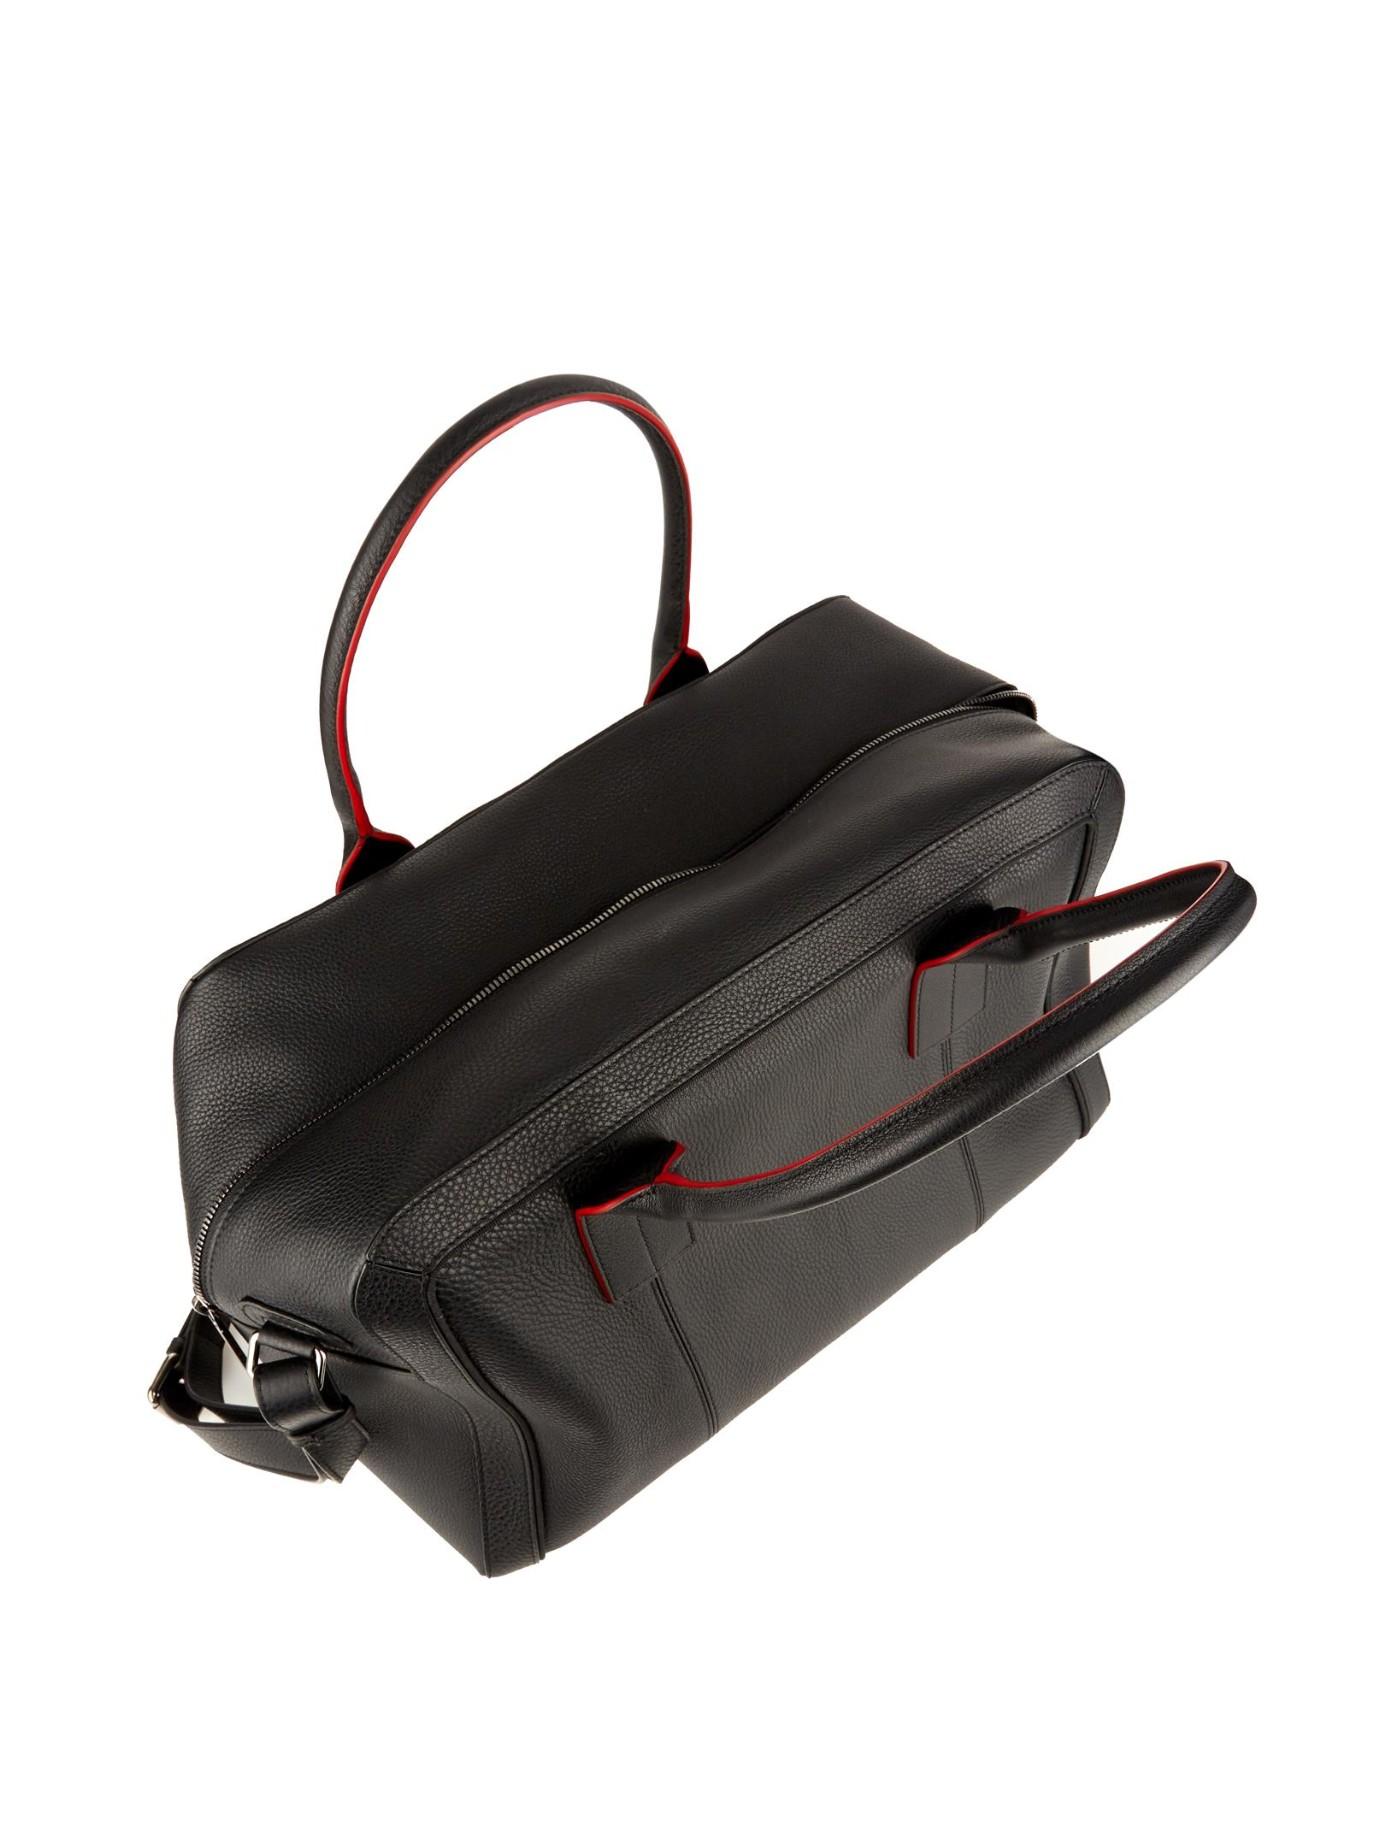 94ae0dcbb75 Christian Louboutin Black Fredo Leather Weekend Bag for men